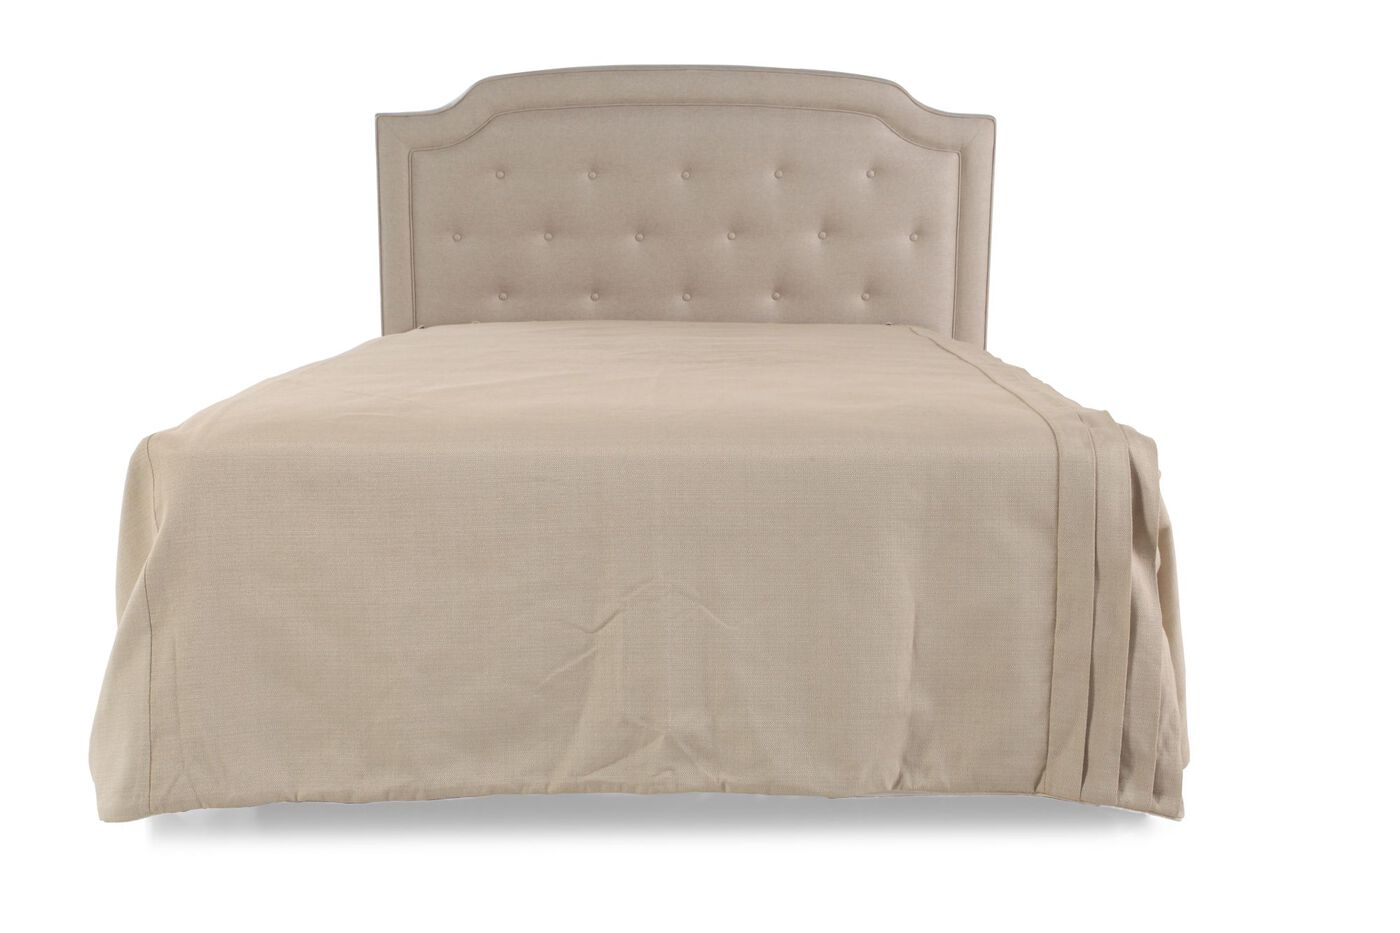 "Wayfair Tufted Headboard Tufted Headboard In Bedroom: Transitional Tufted 55"" Queen Headboard In White"